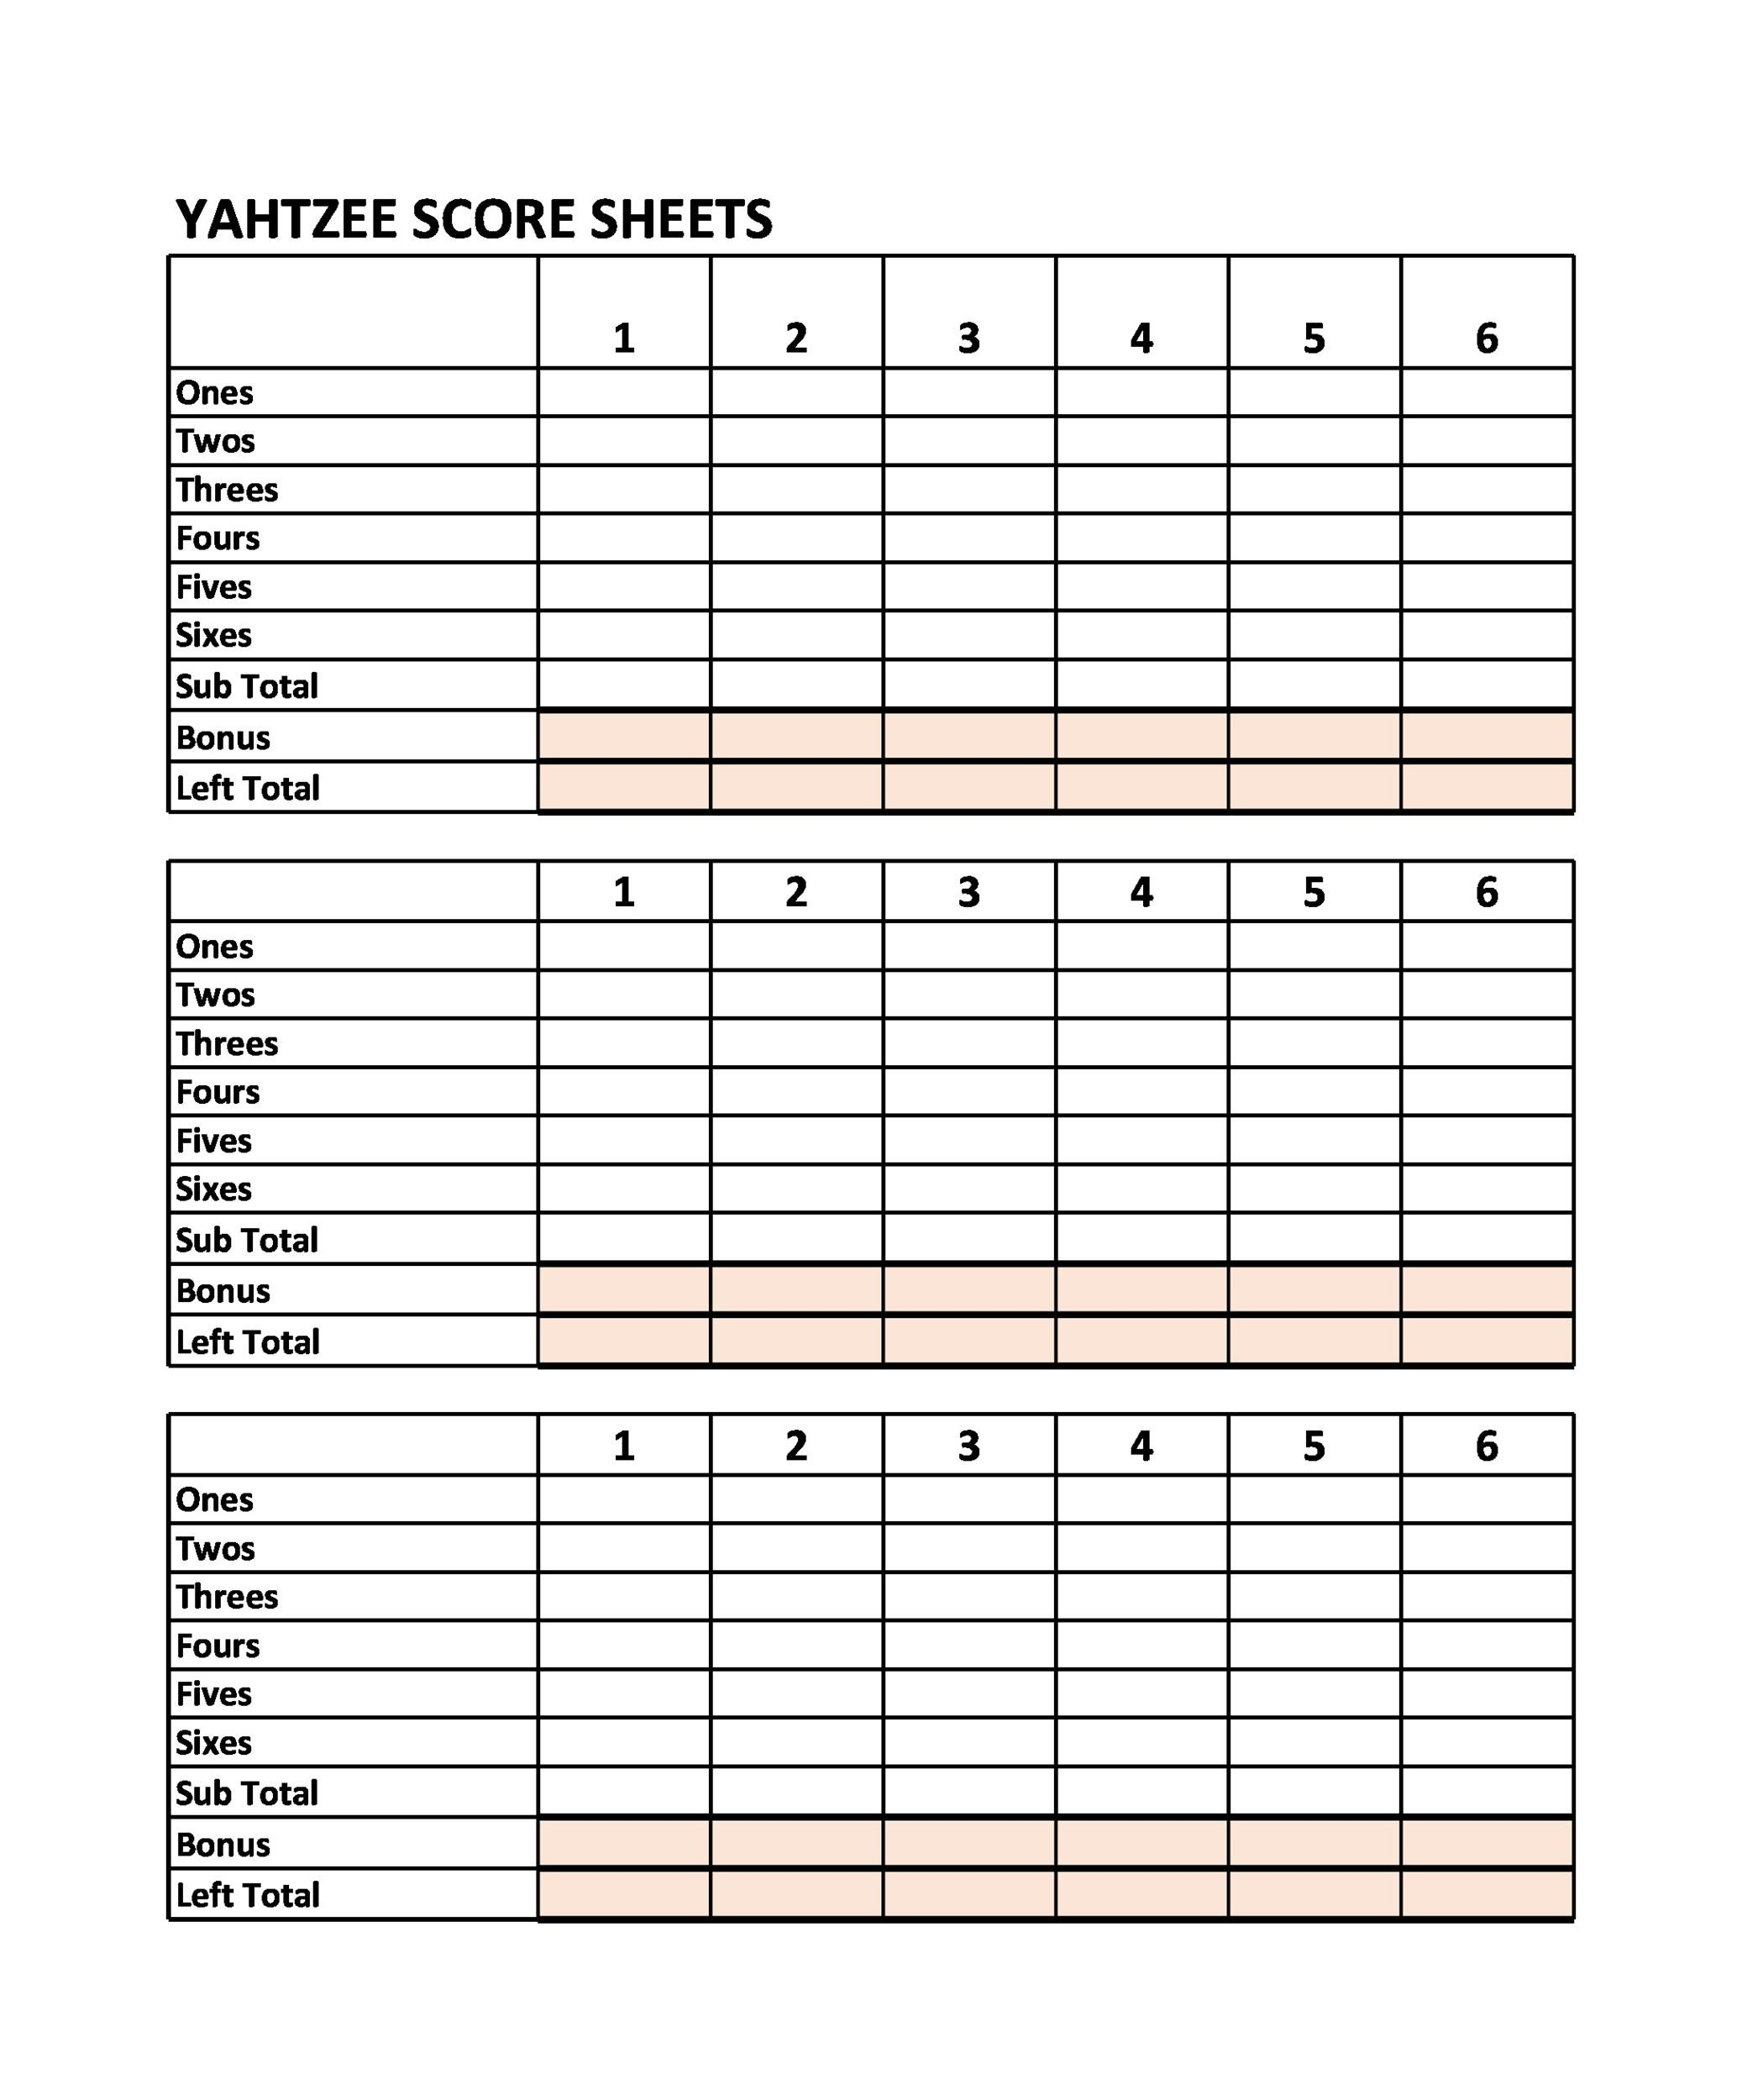 Free Yahtzee Score Sheets 26